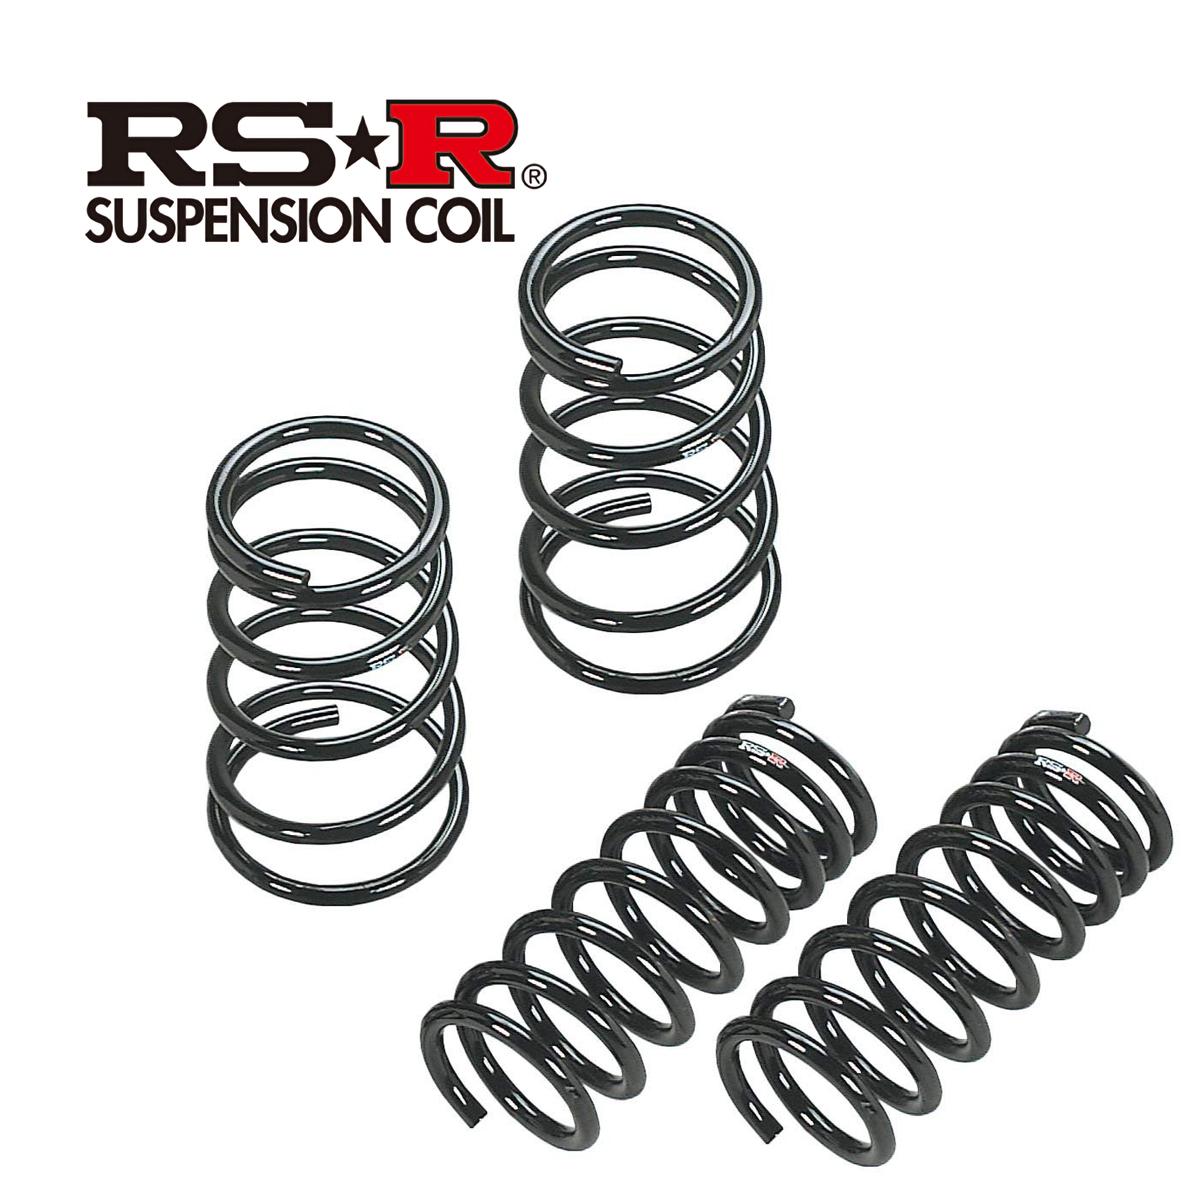 RS-R セレナ ライダー C26 ダウンサス スプリング リア N700WR RSR 個人宅発送追金有